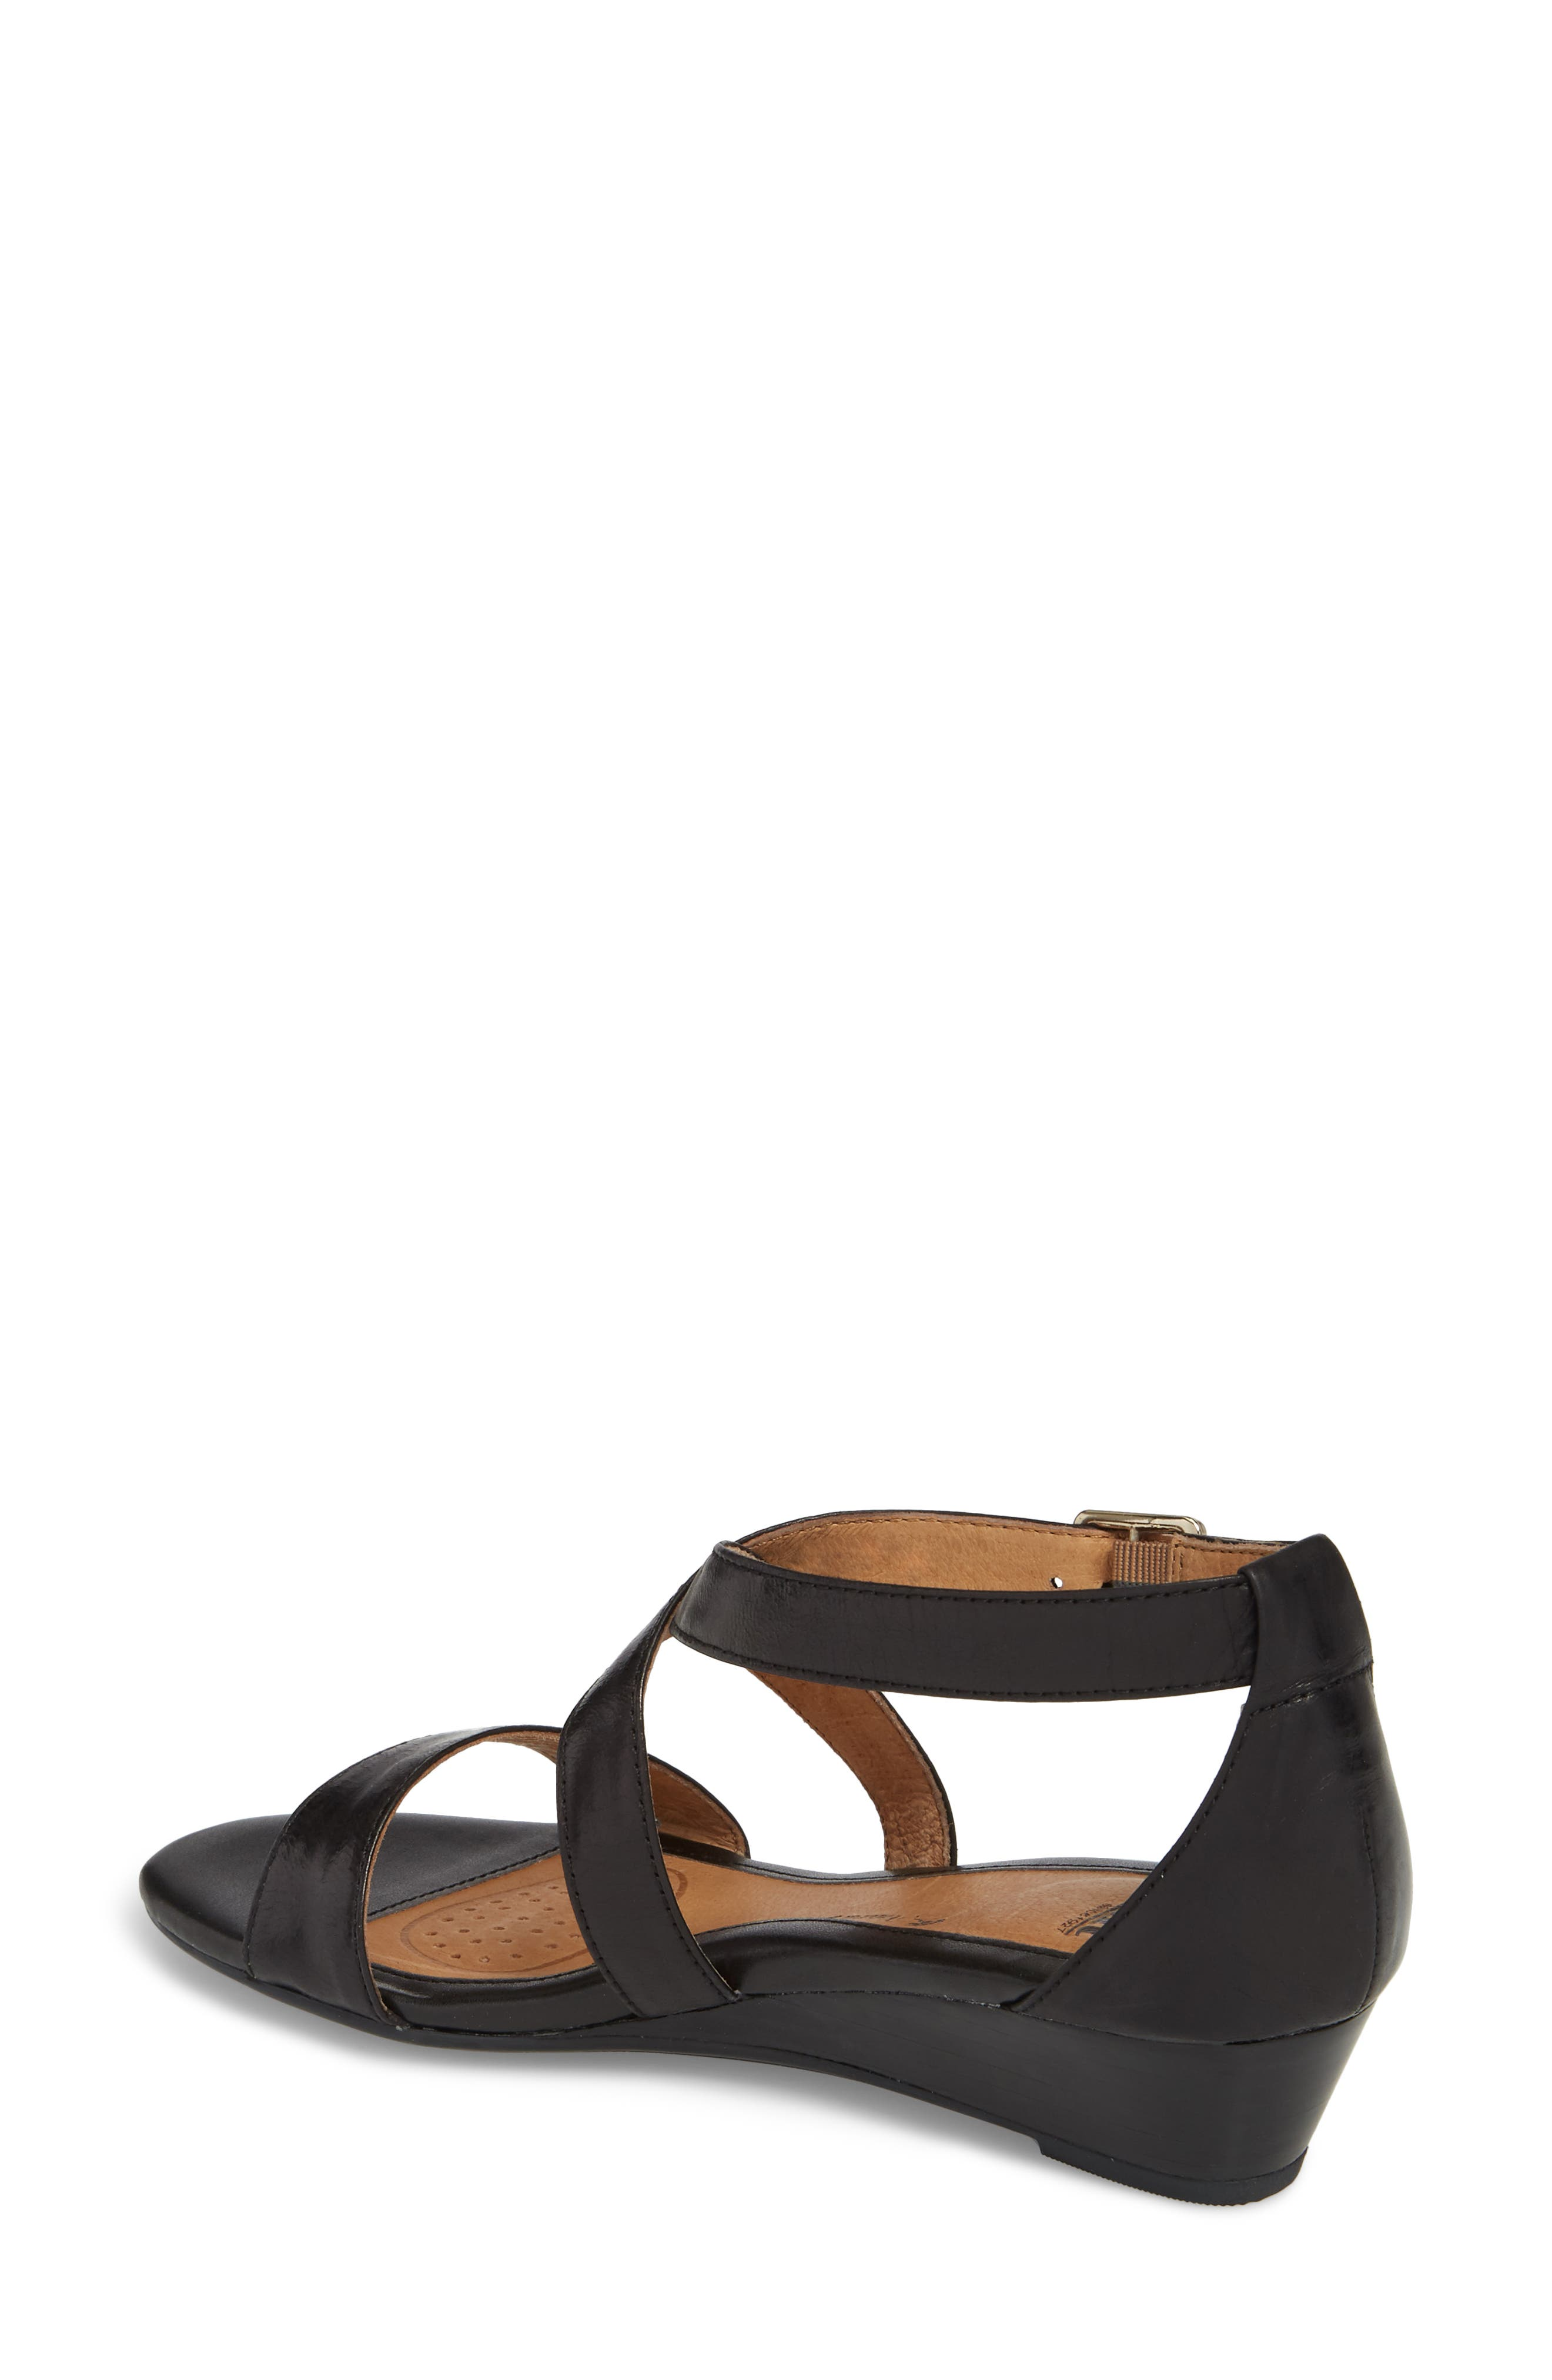 'Innis' Low Wedge Sandal,                             Alternate thumbnail 2, color,                             Black Leather